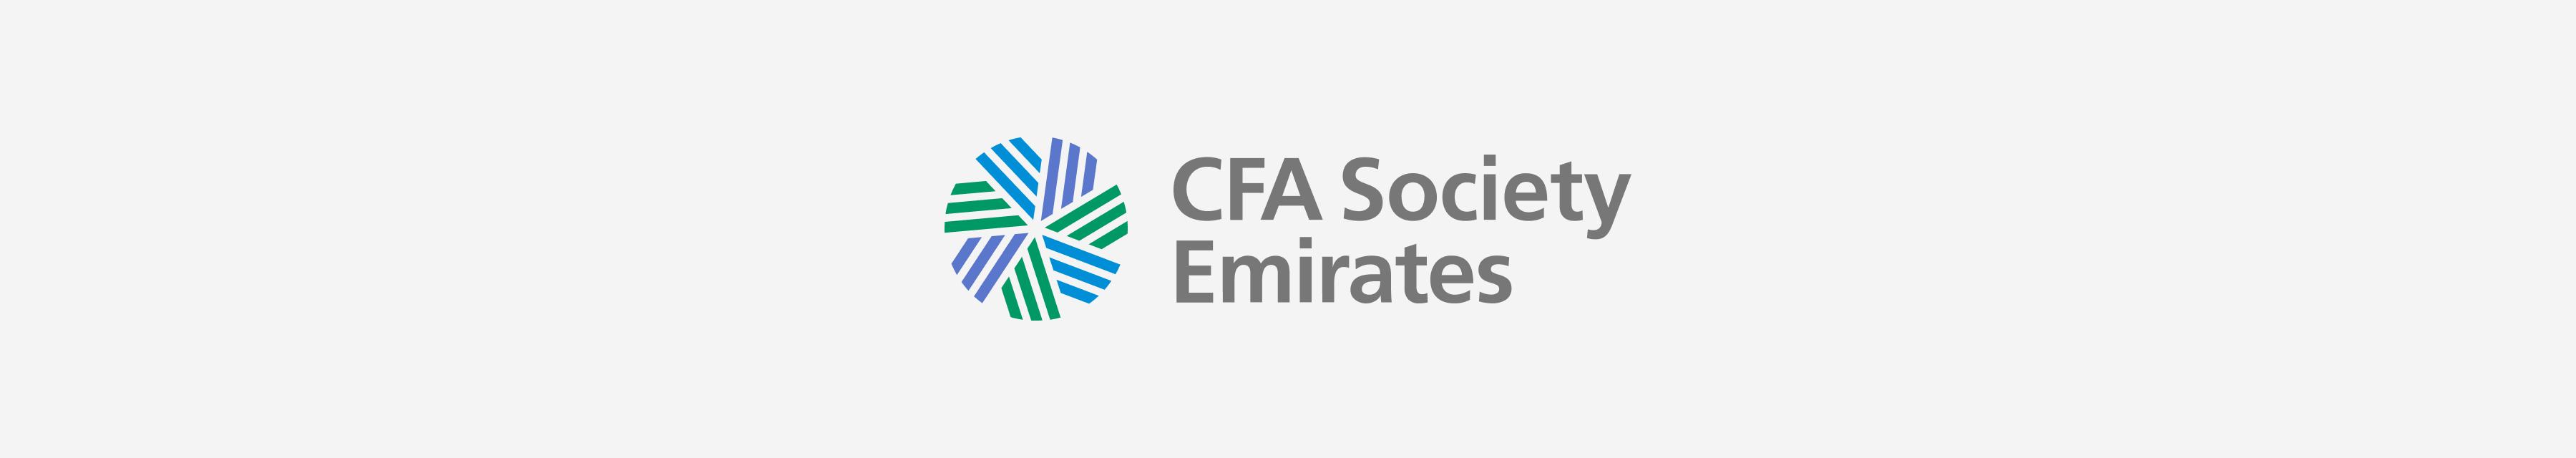 CFA Society Emirates